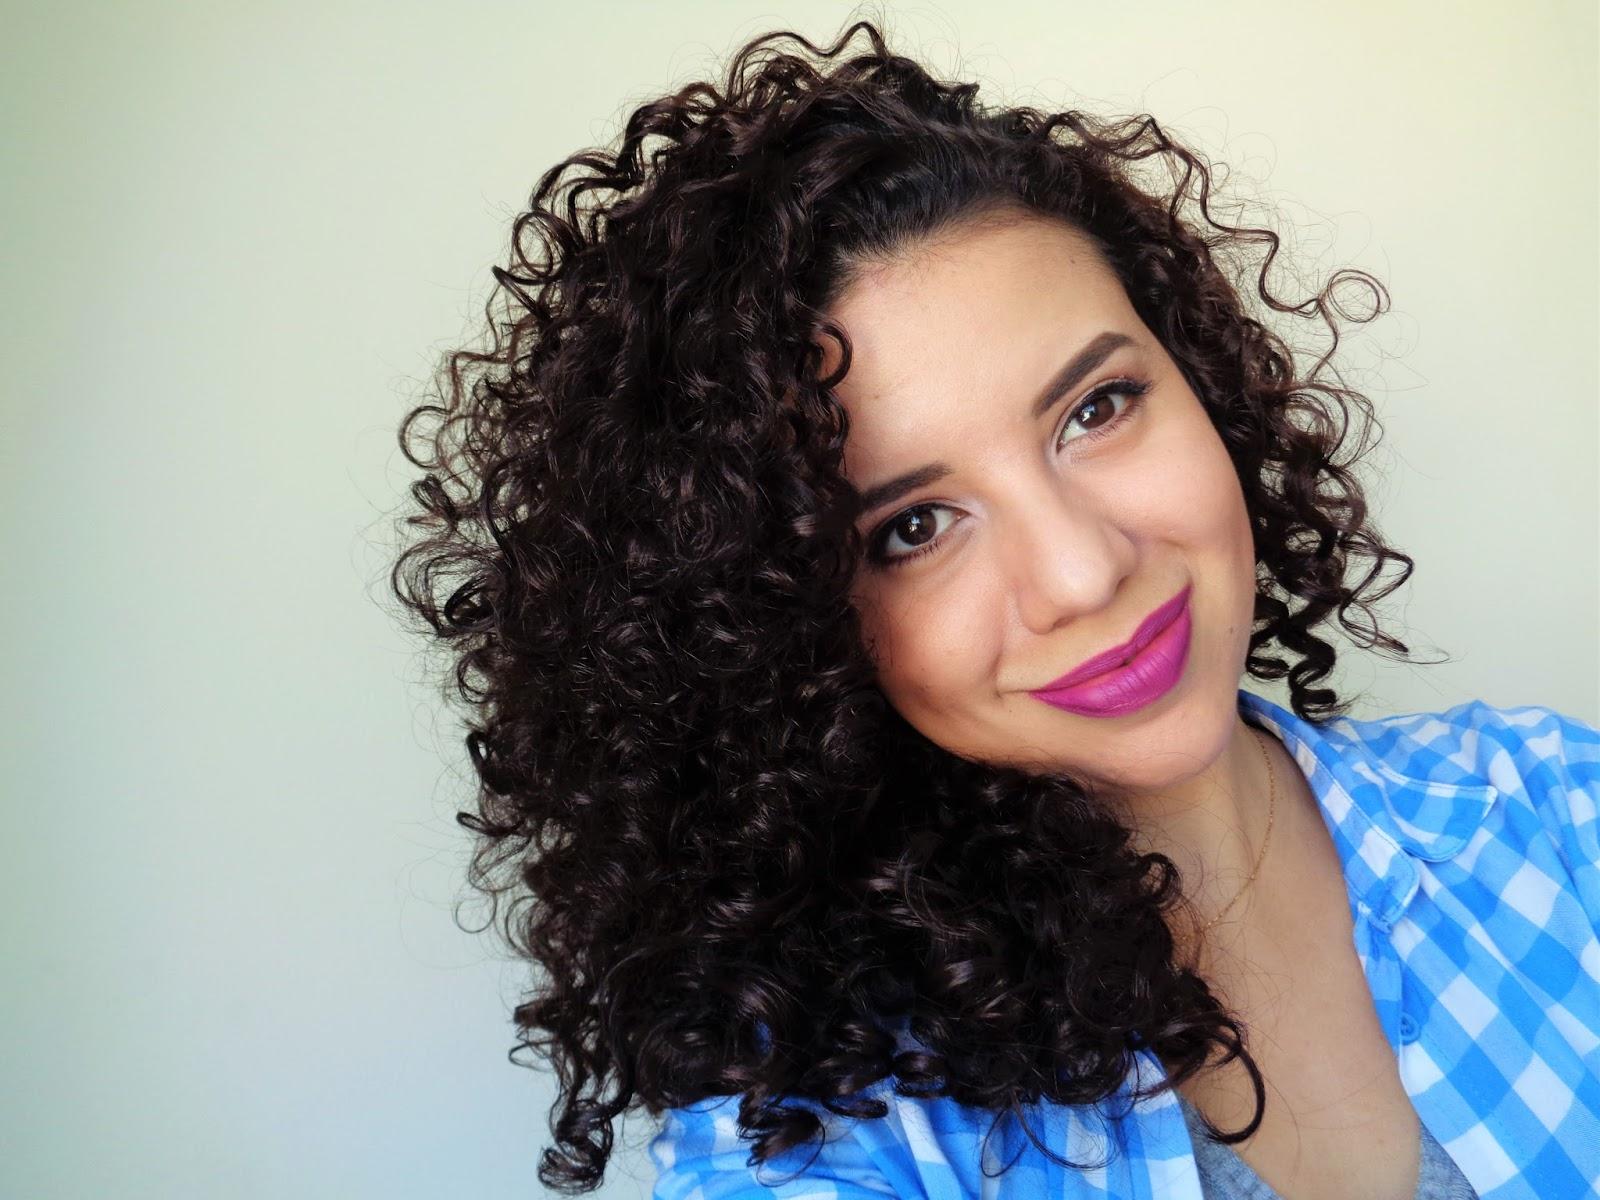 Karina Guimarães